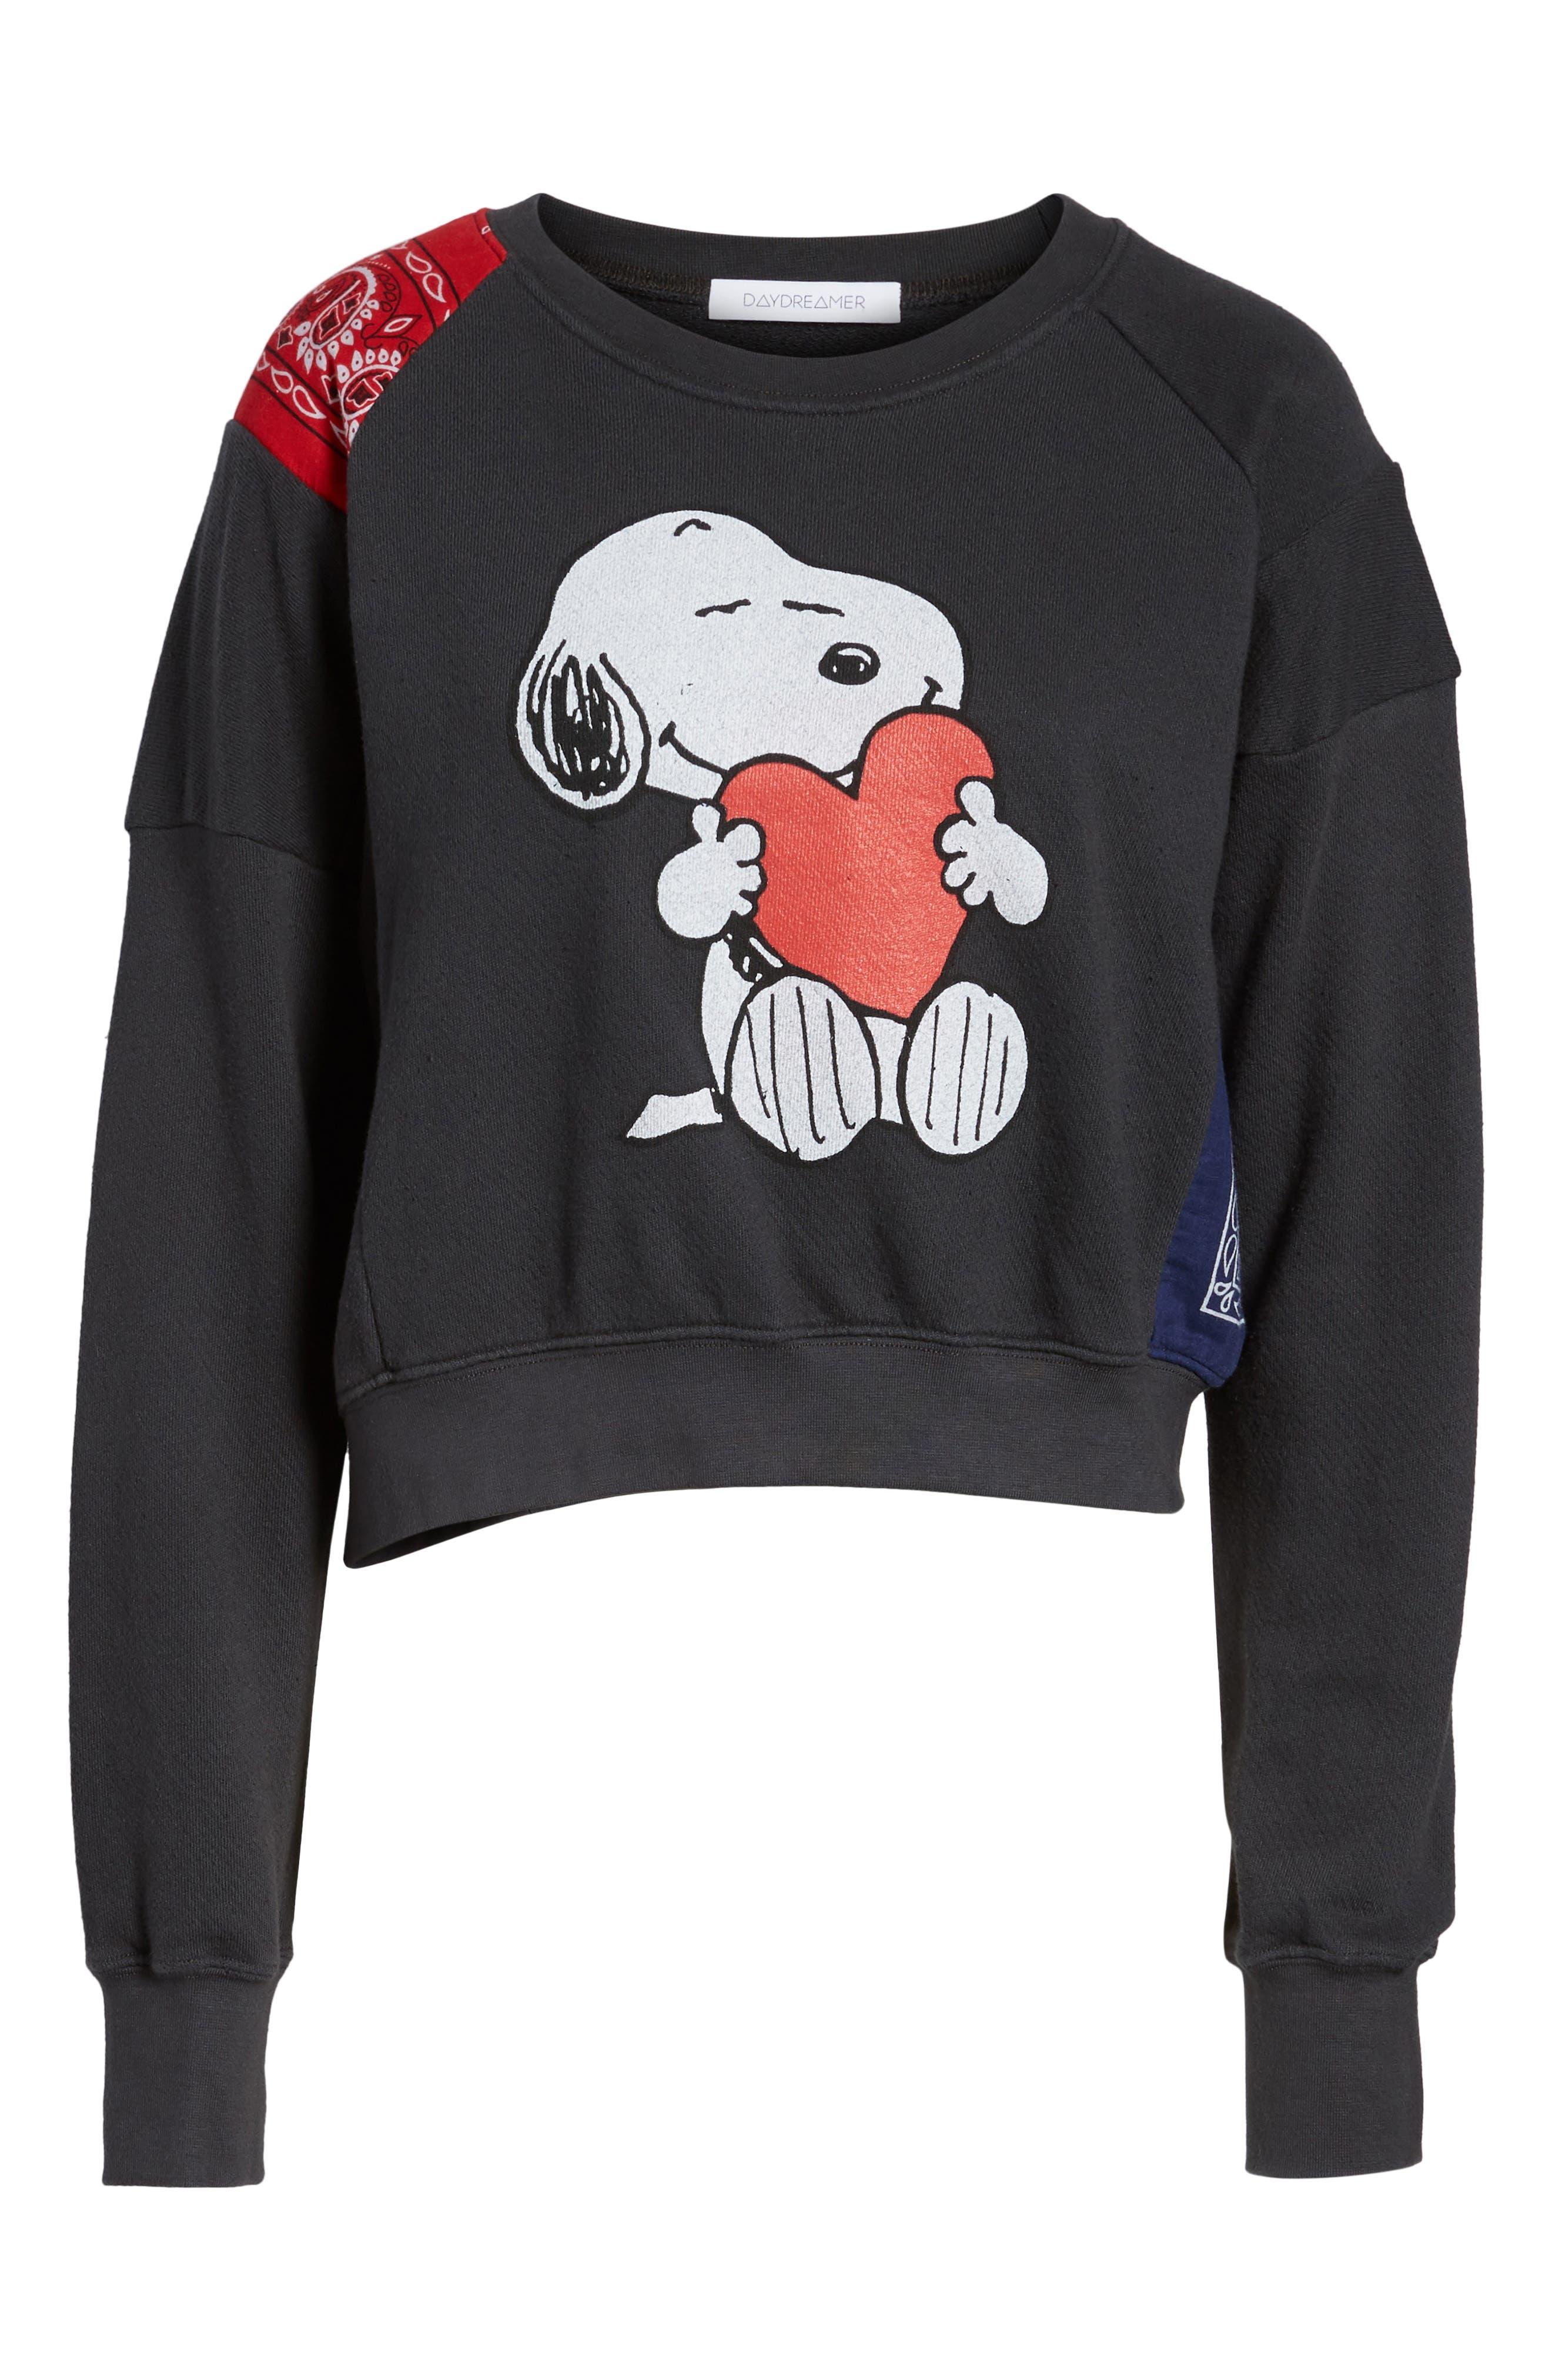 DAYDREAMER Snoopy Bandana Panel Sweatshirt in Black